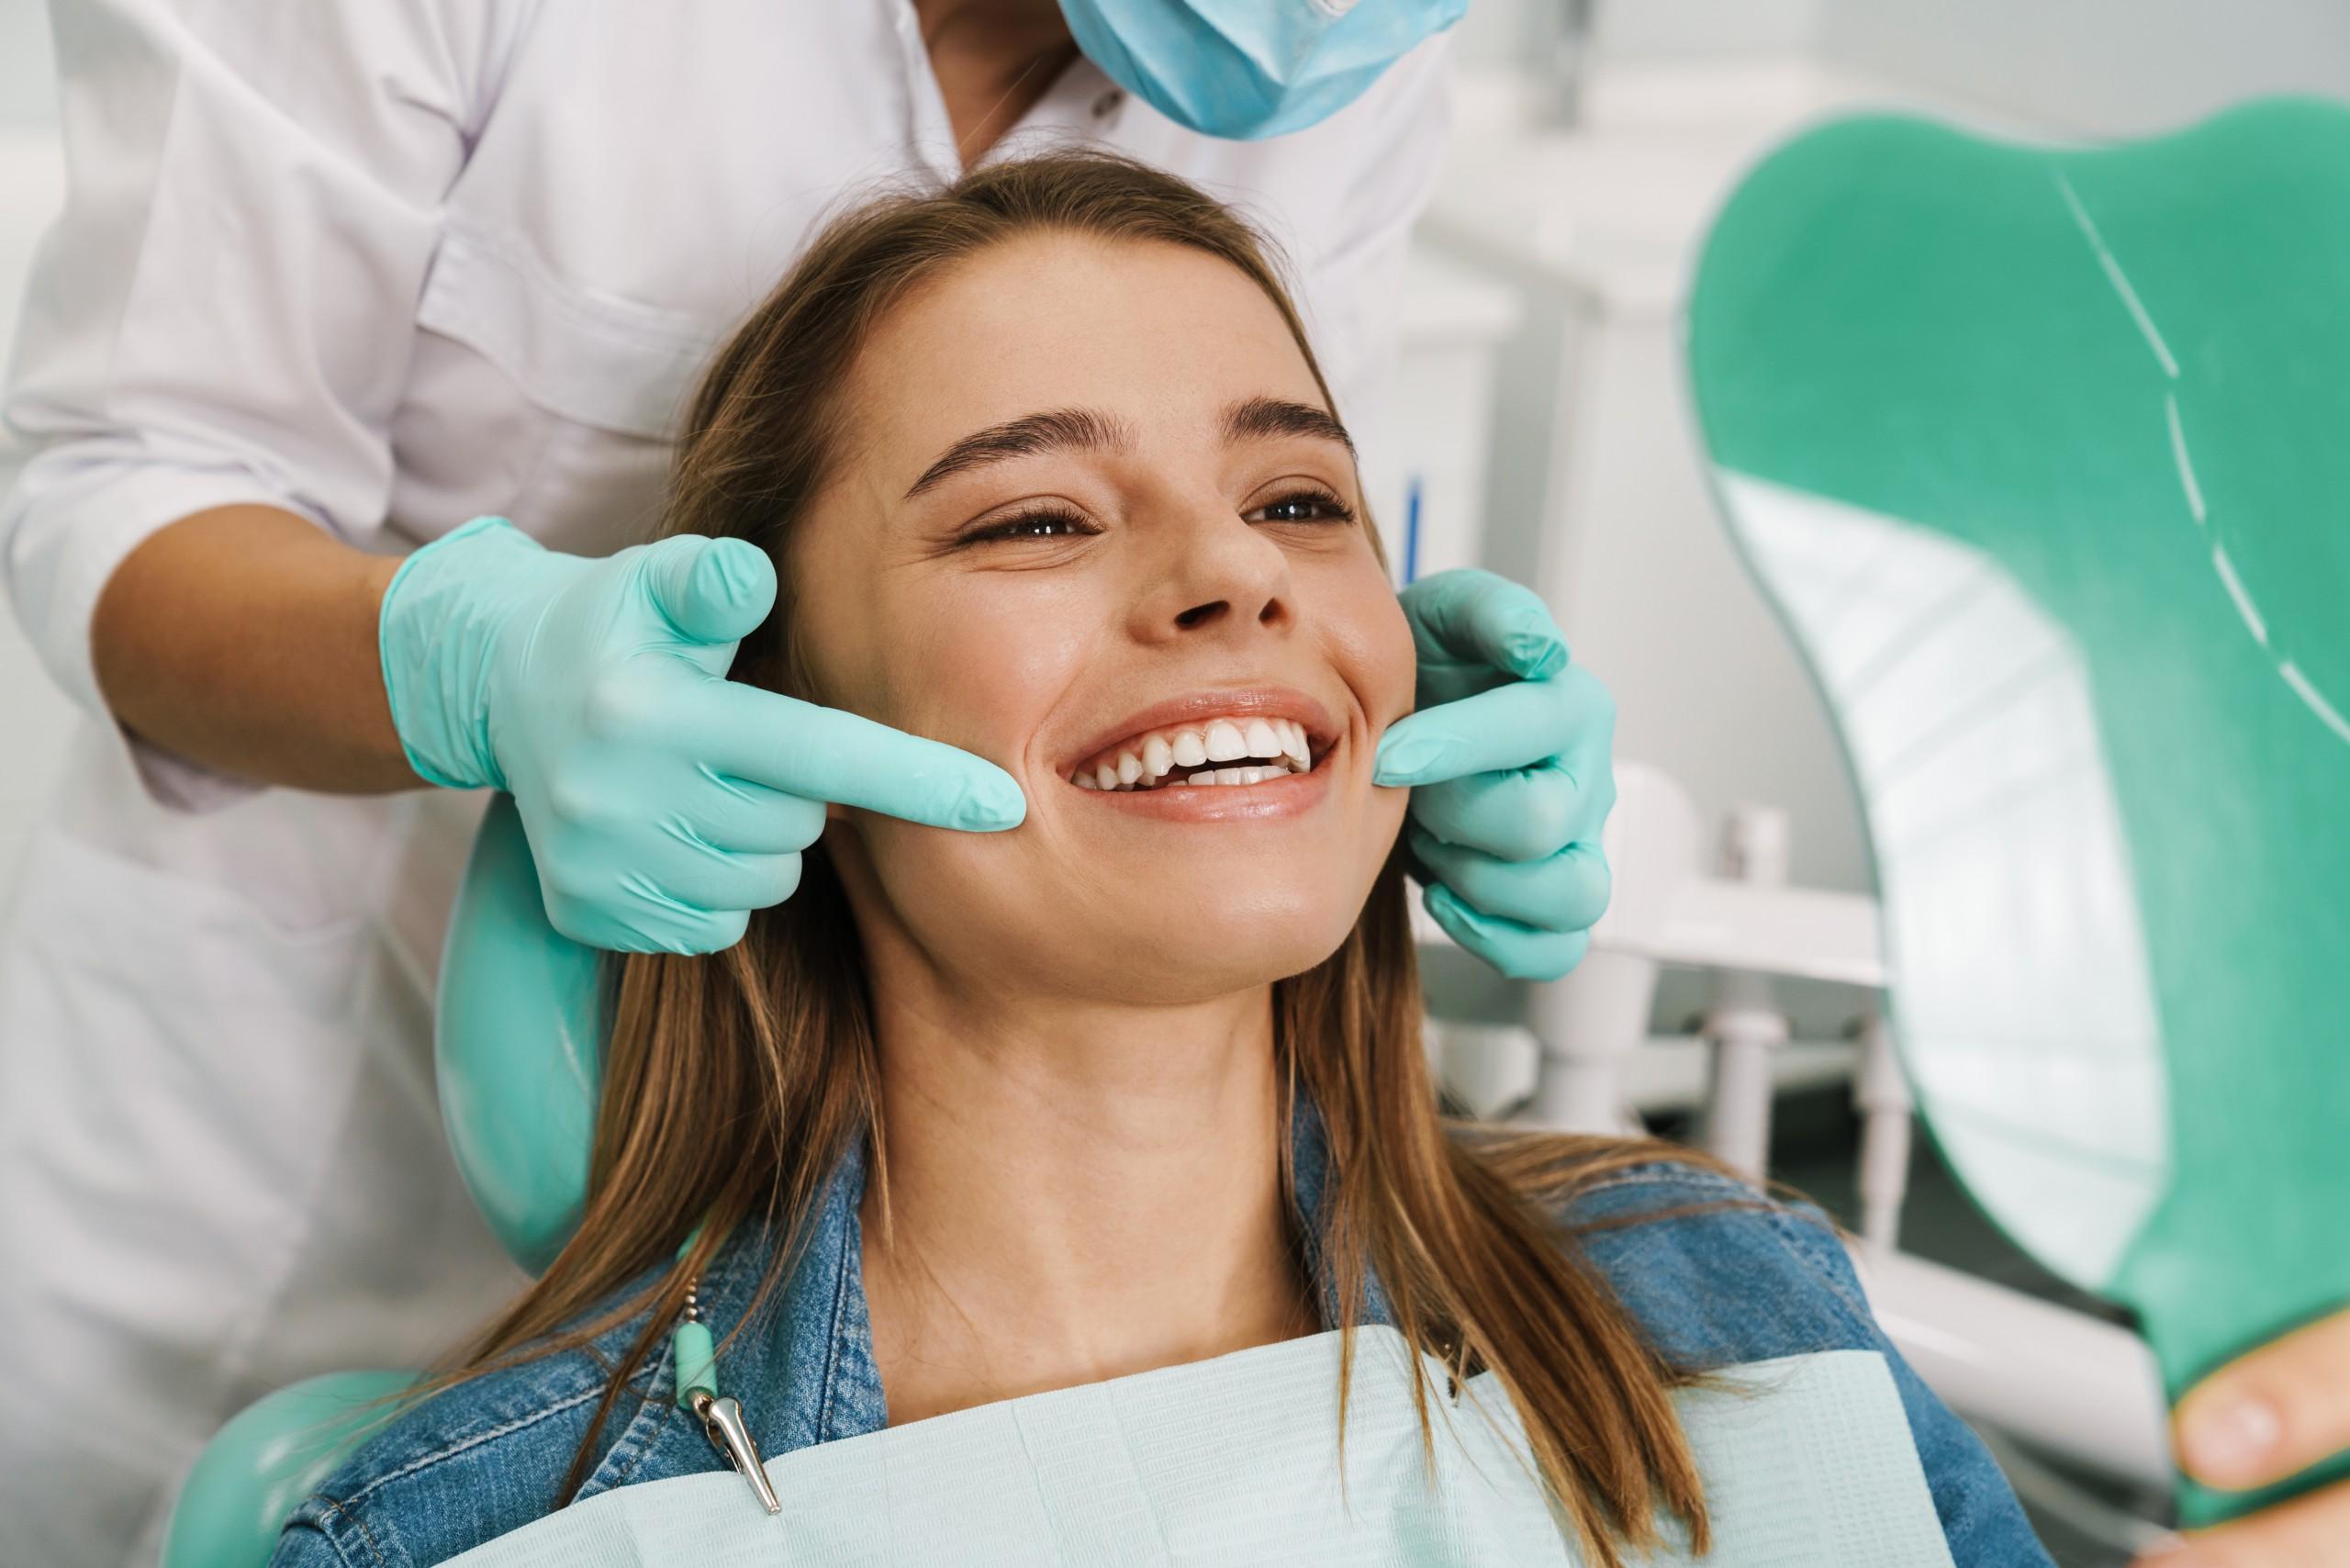 woman getting dental work